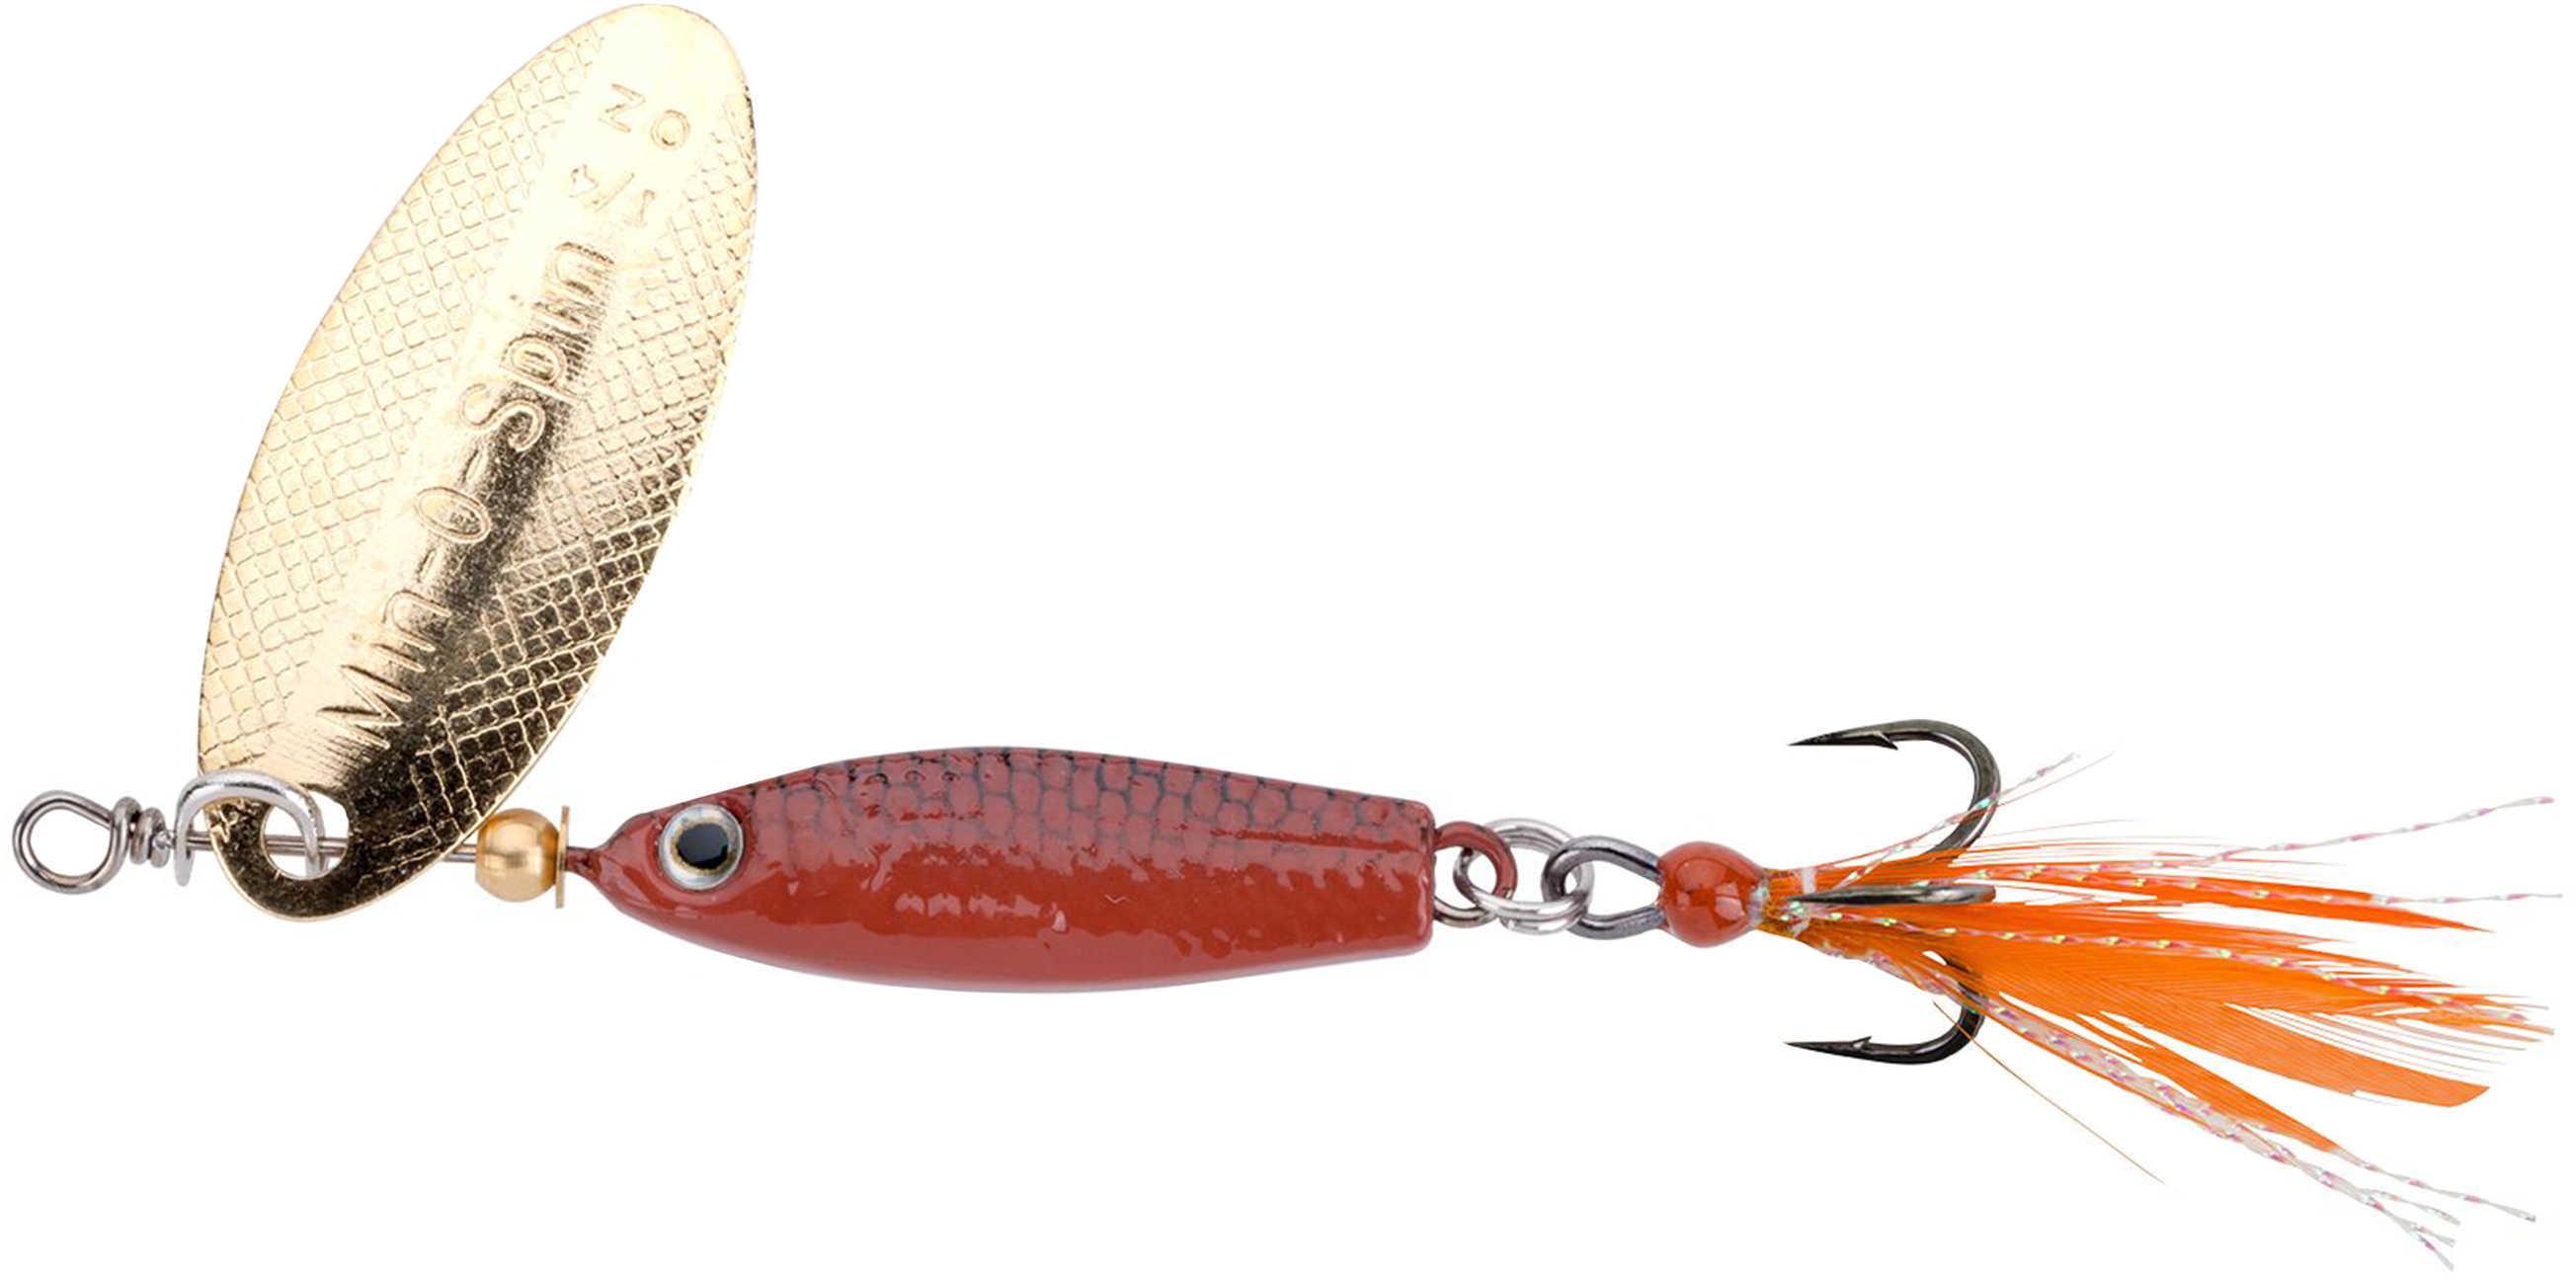 "Johnson Min-O-Spin 3/4"" Length, 1/16 oz, Brown Grasshopper Md: 1371926"